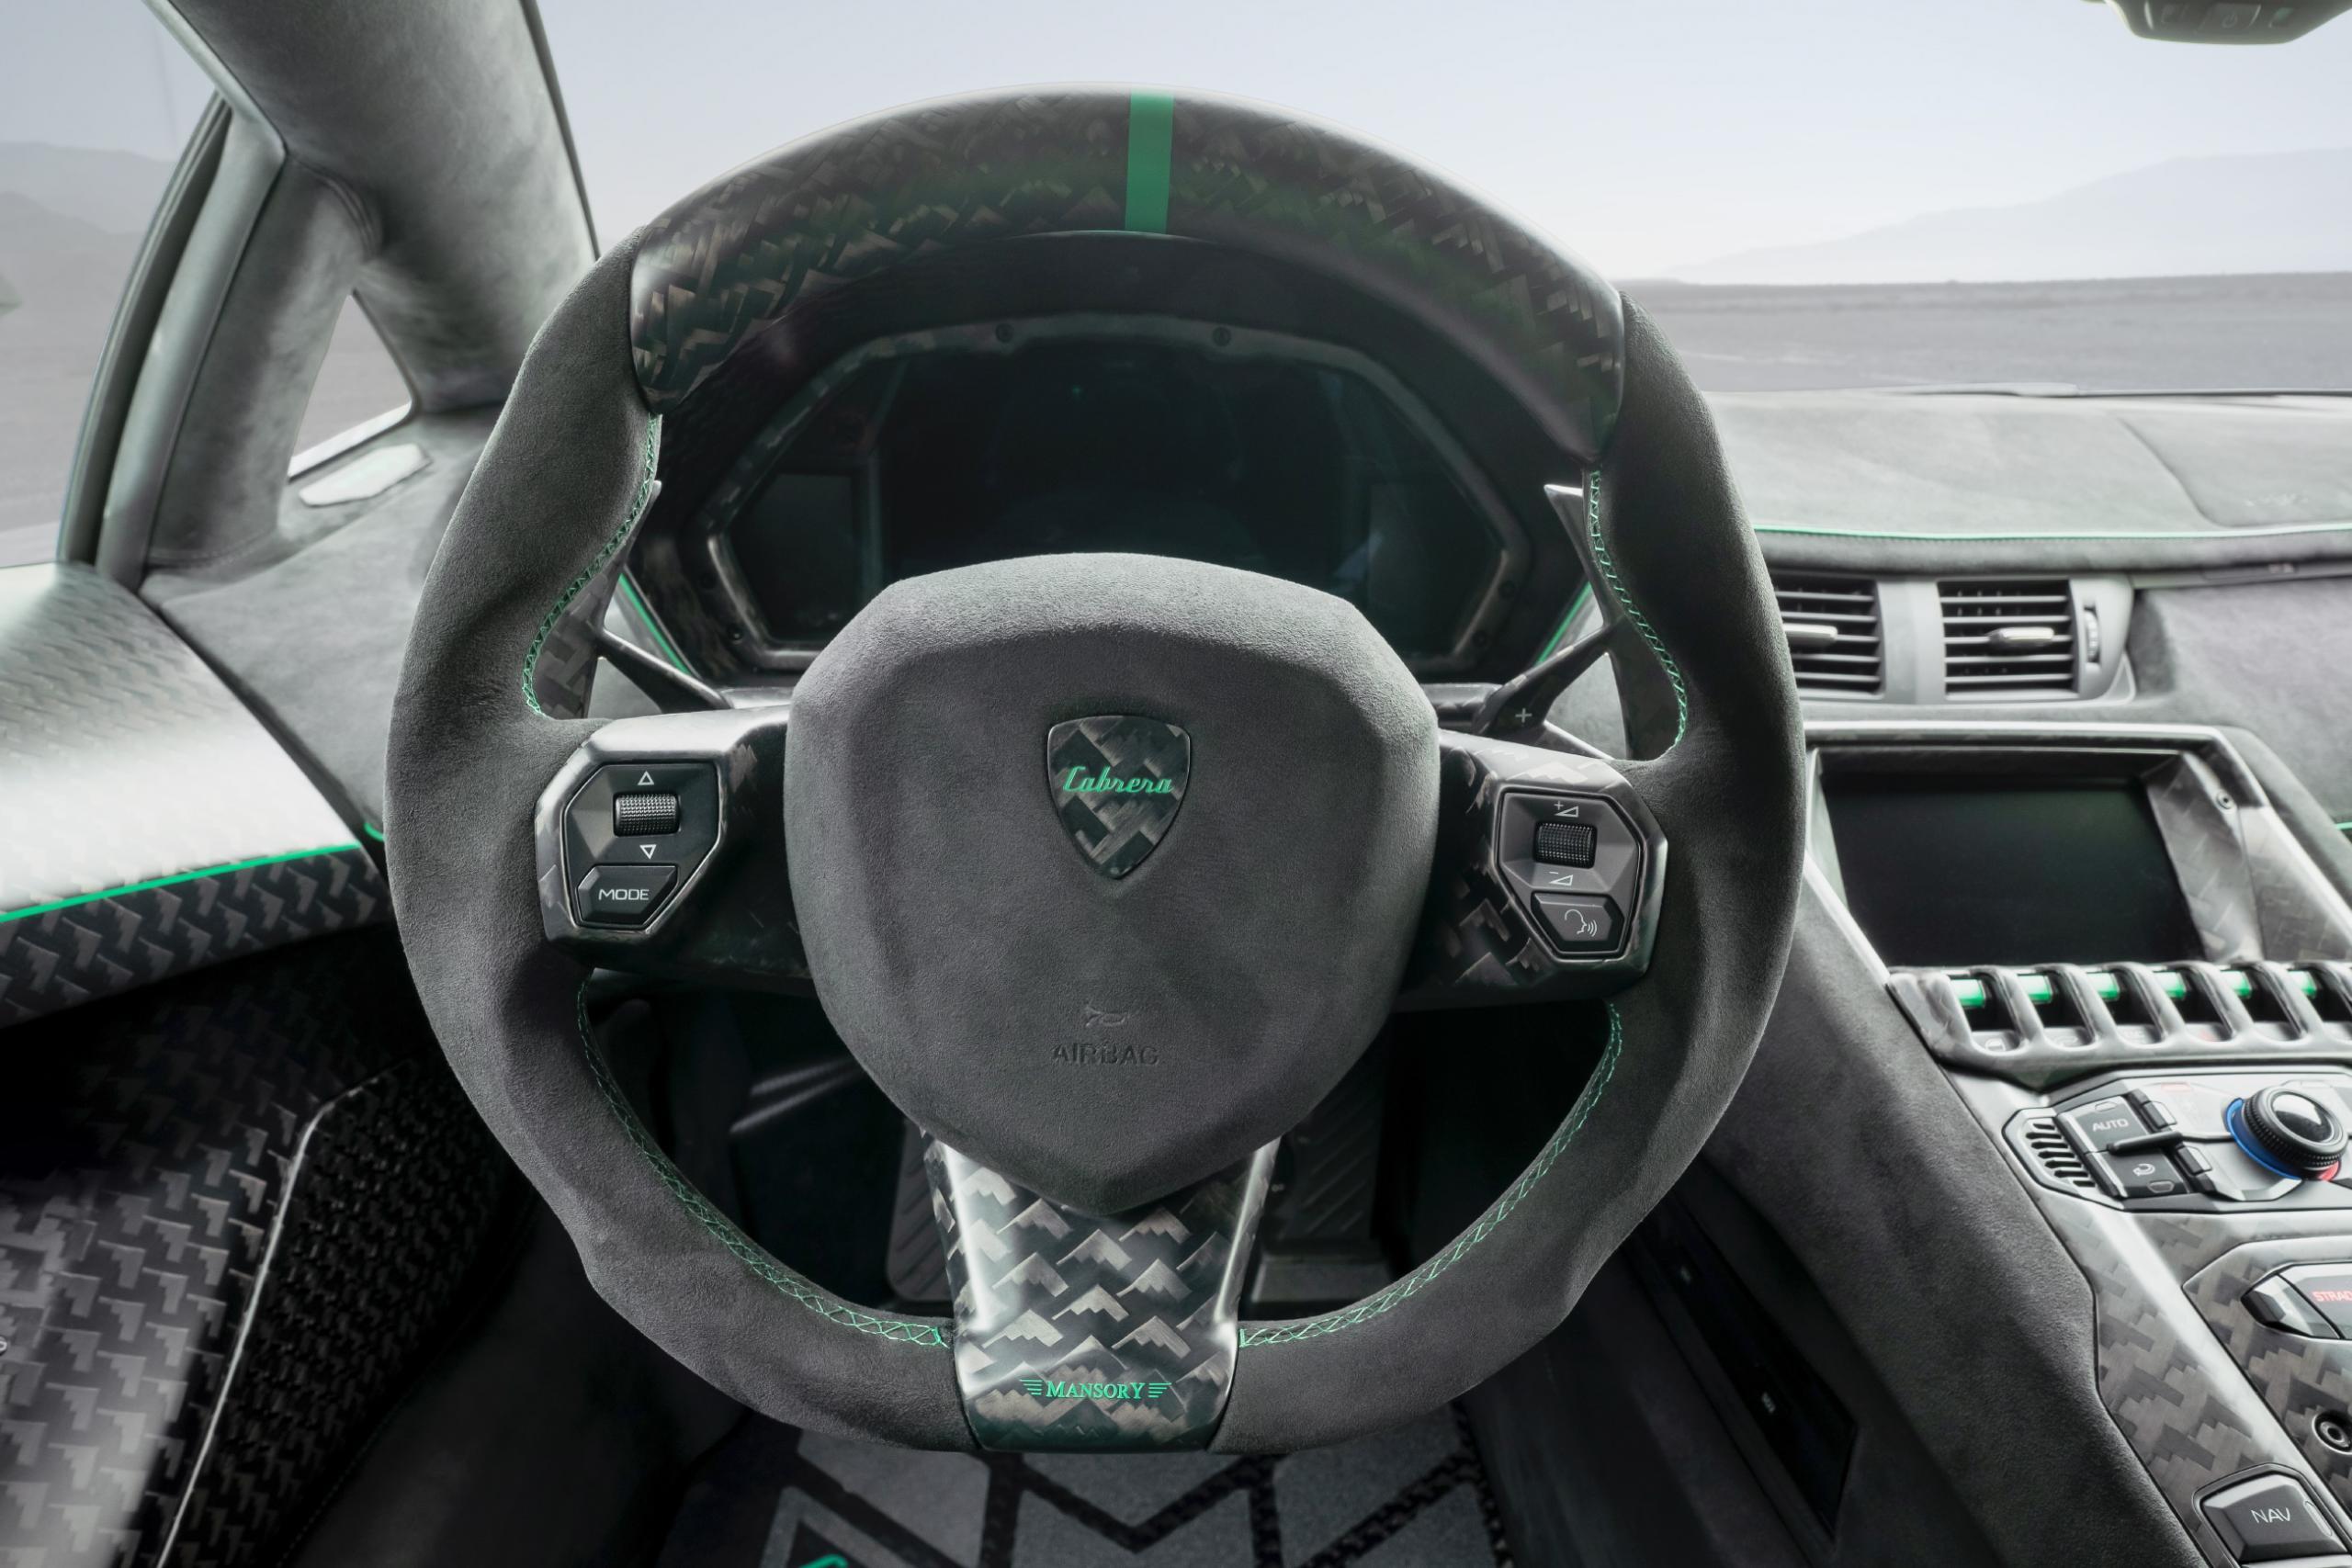 Mansory Lamborghini Aventador SVJ Steering Wheel